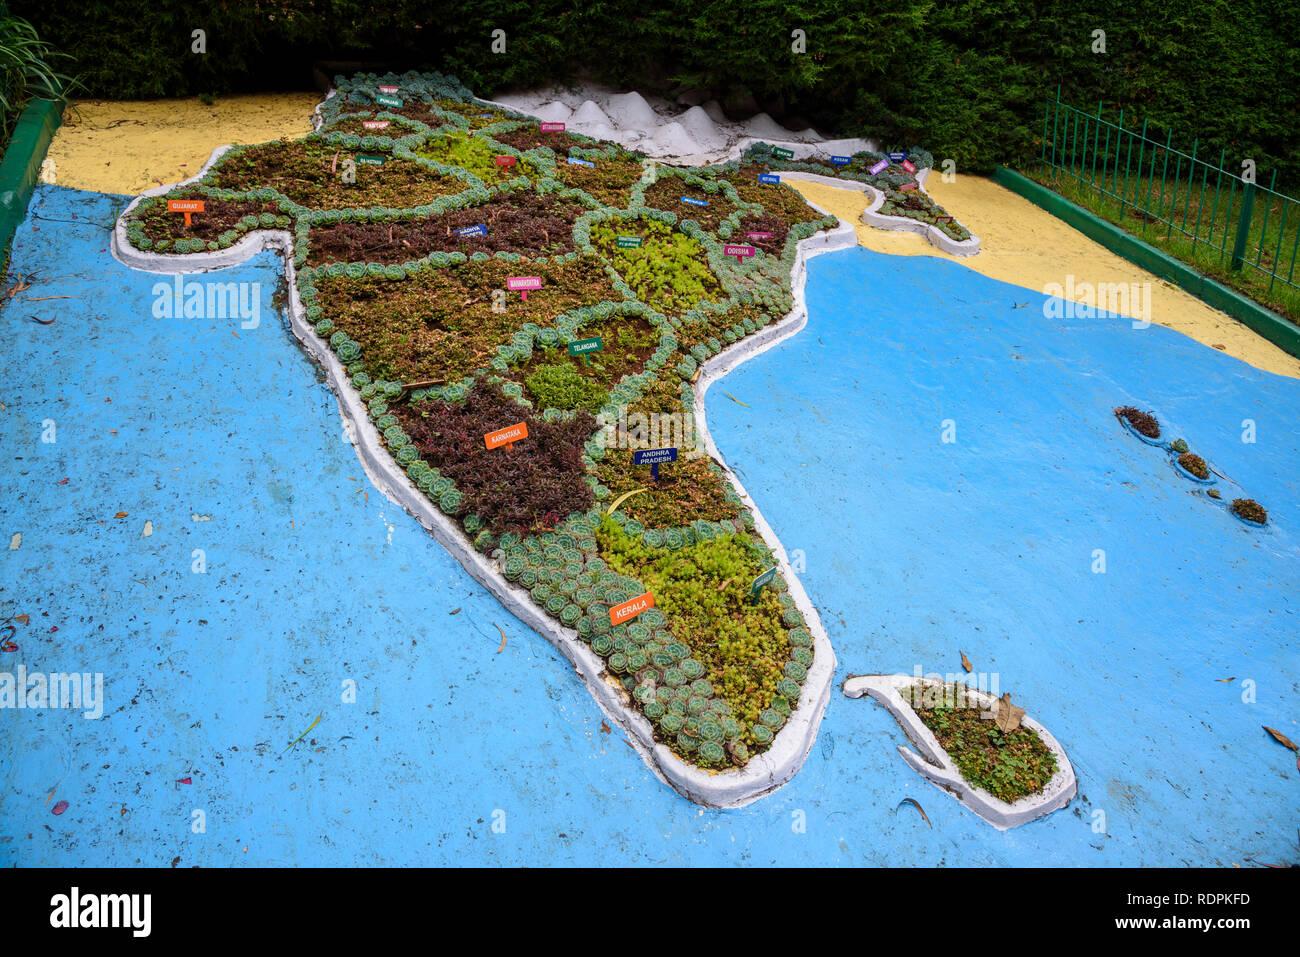 Botanical Gardens, Ooty, Nilgiri Hills, Tamil Nadu, India - Stock Image